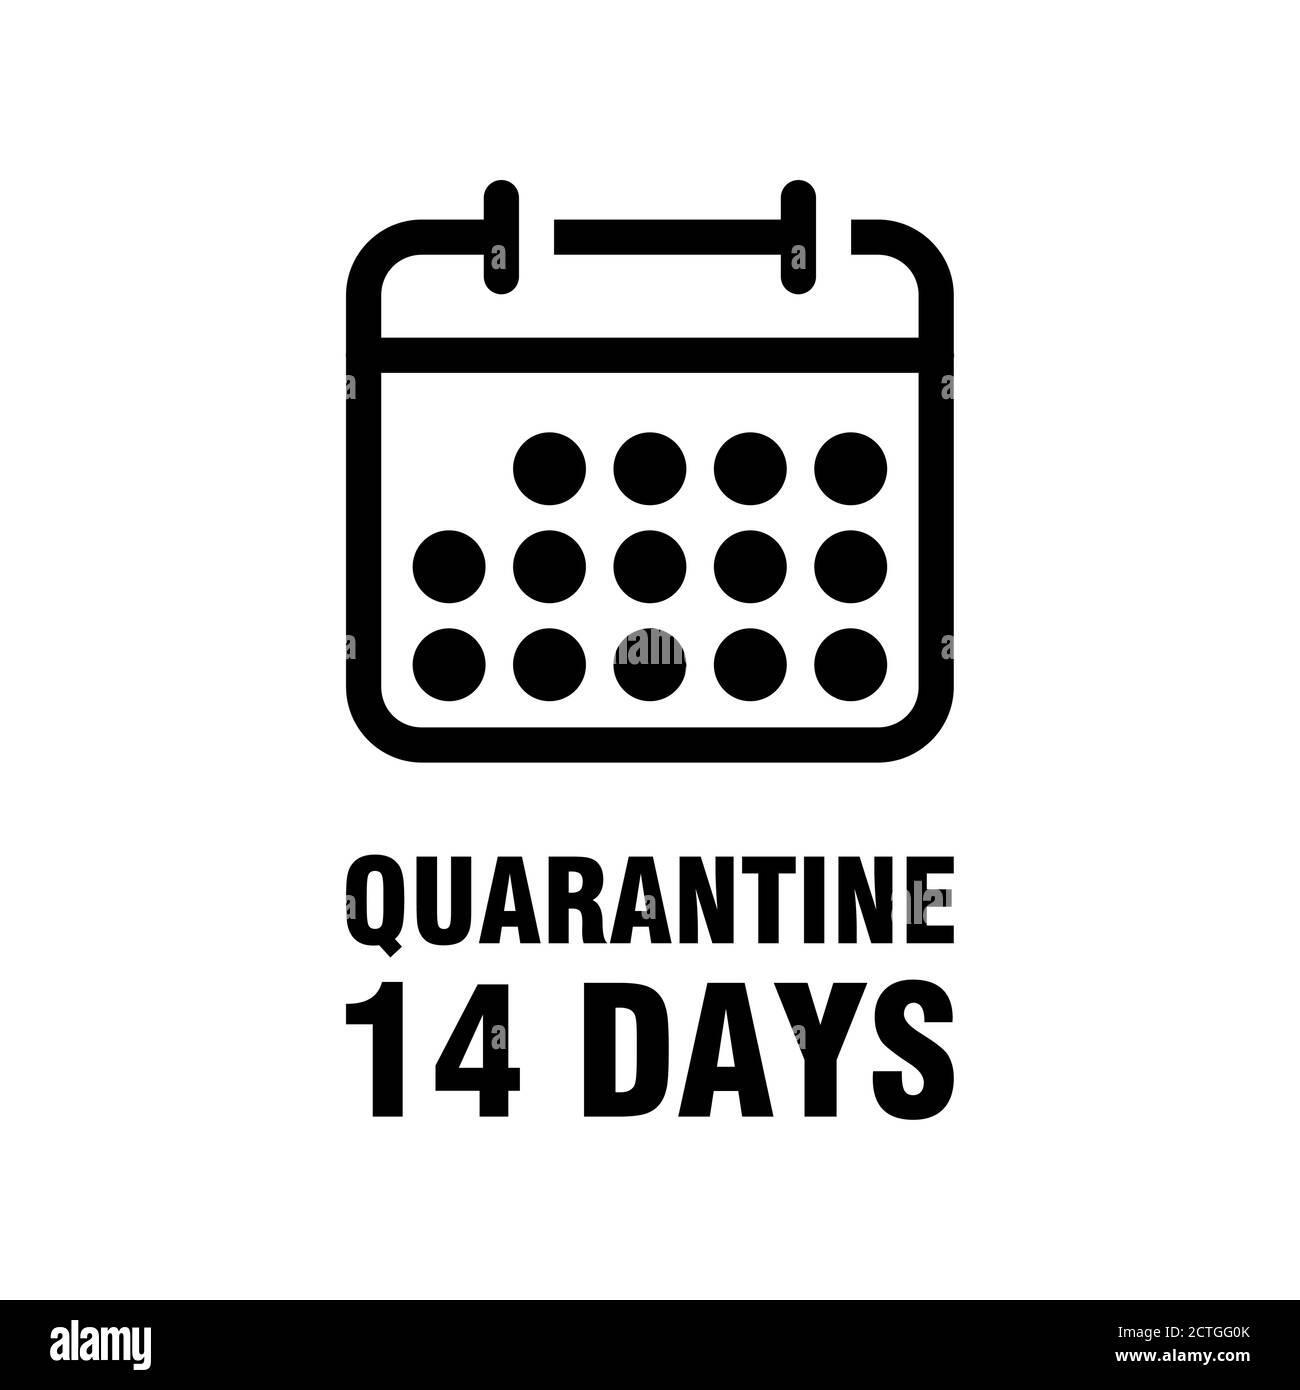 Quarantine 14 Days Calendar Icon. Vector Image. Stock Vector